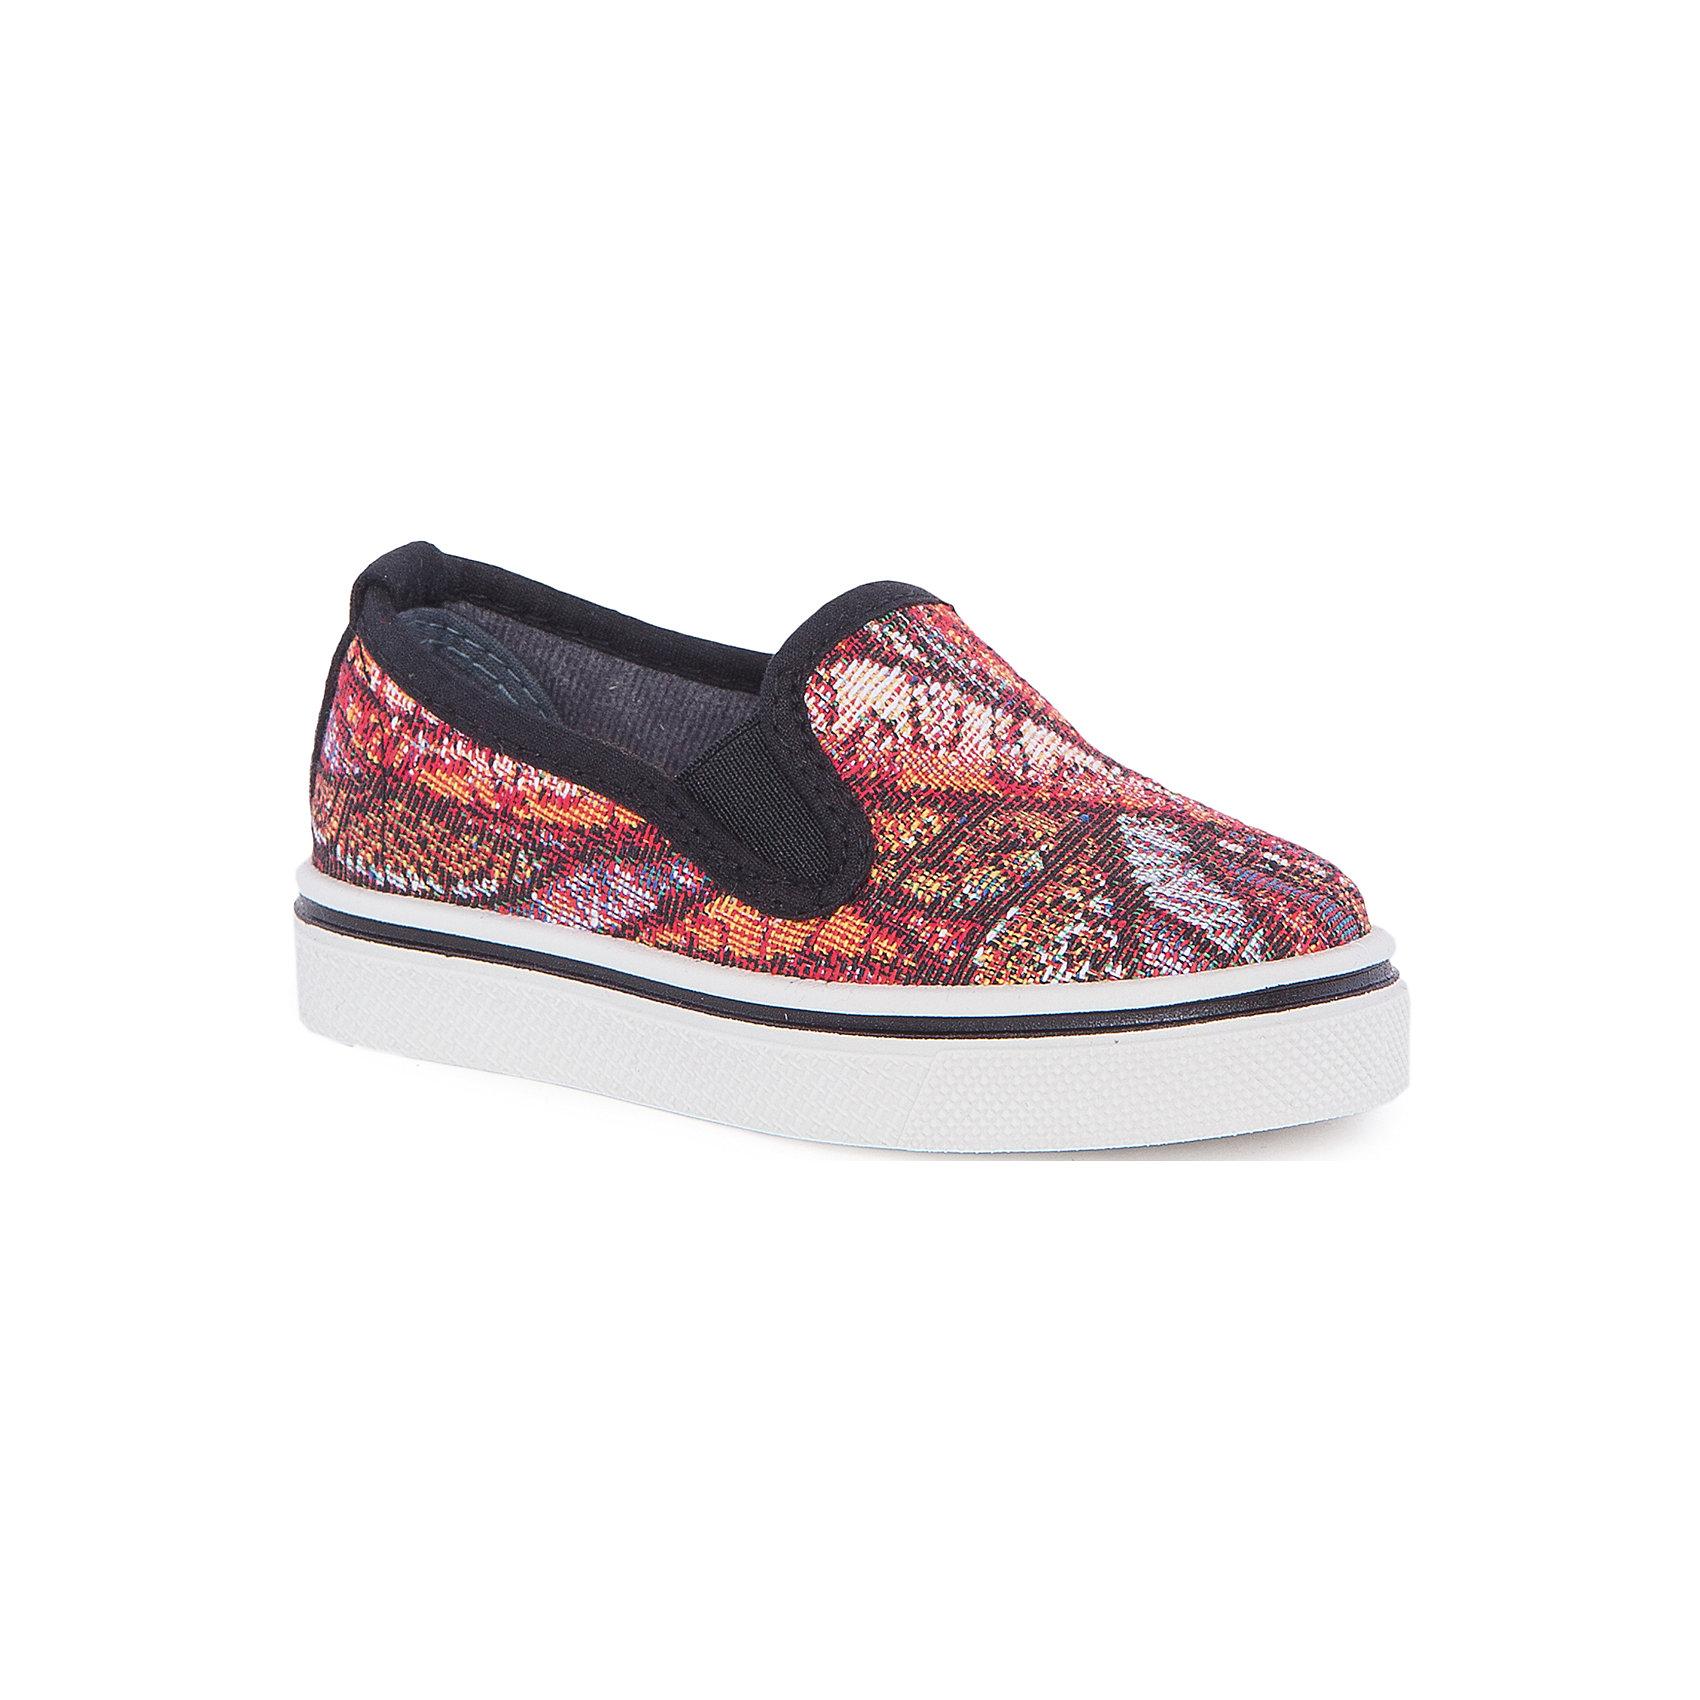 CHICCO Туфли для девочки CHICCO